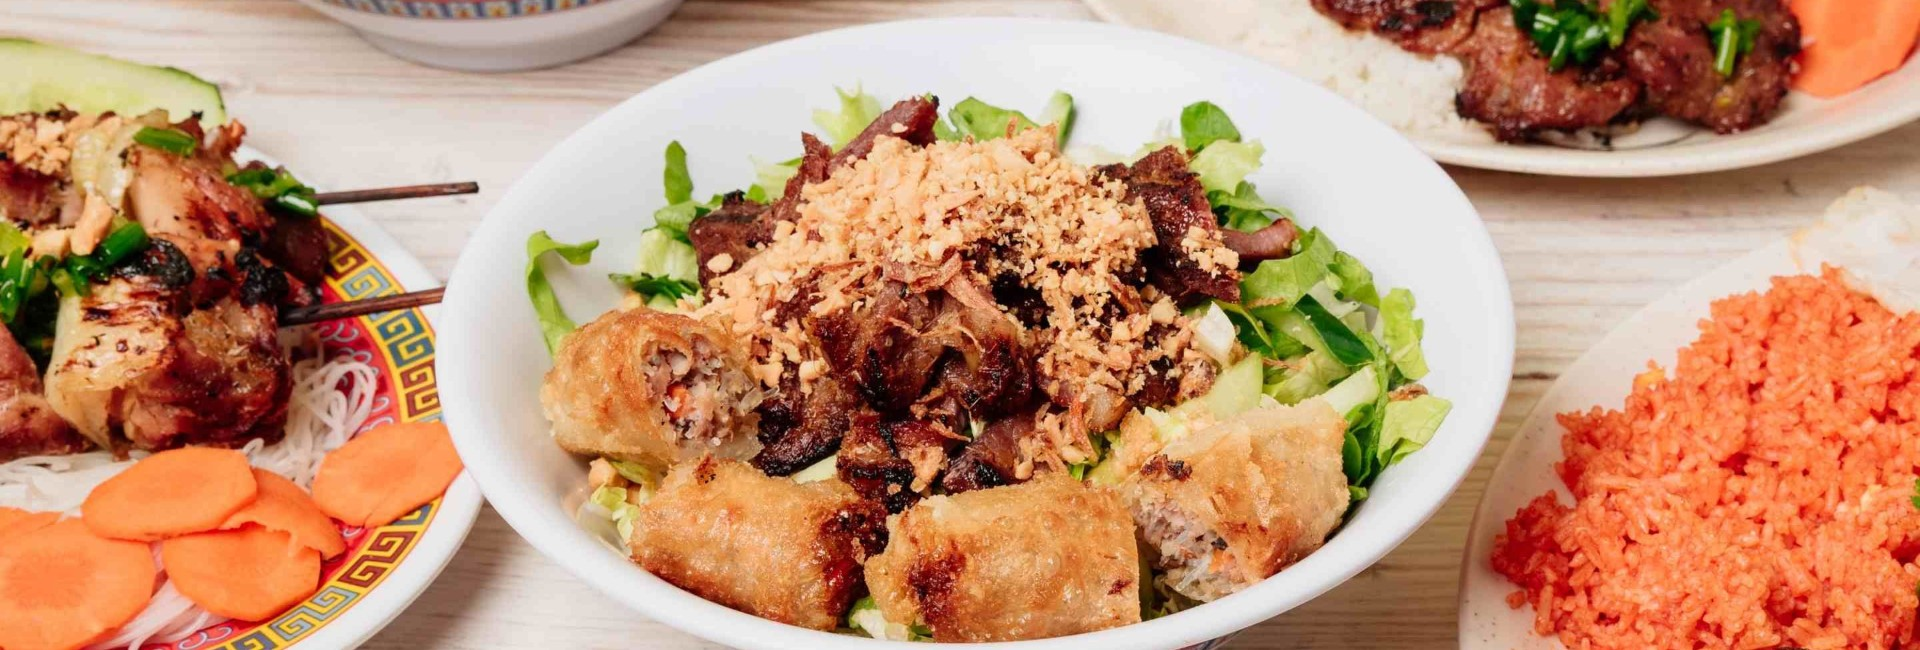 Top 15 restaurants vietnamiens à visiter à Paris